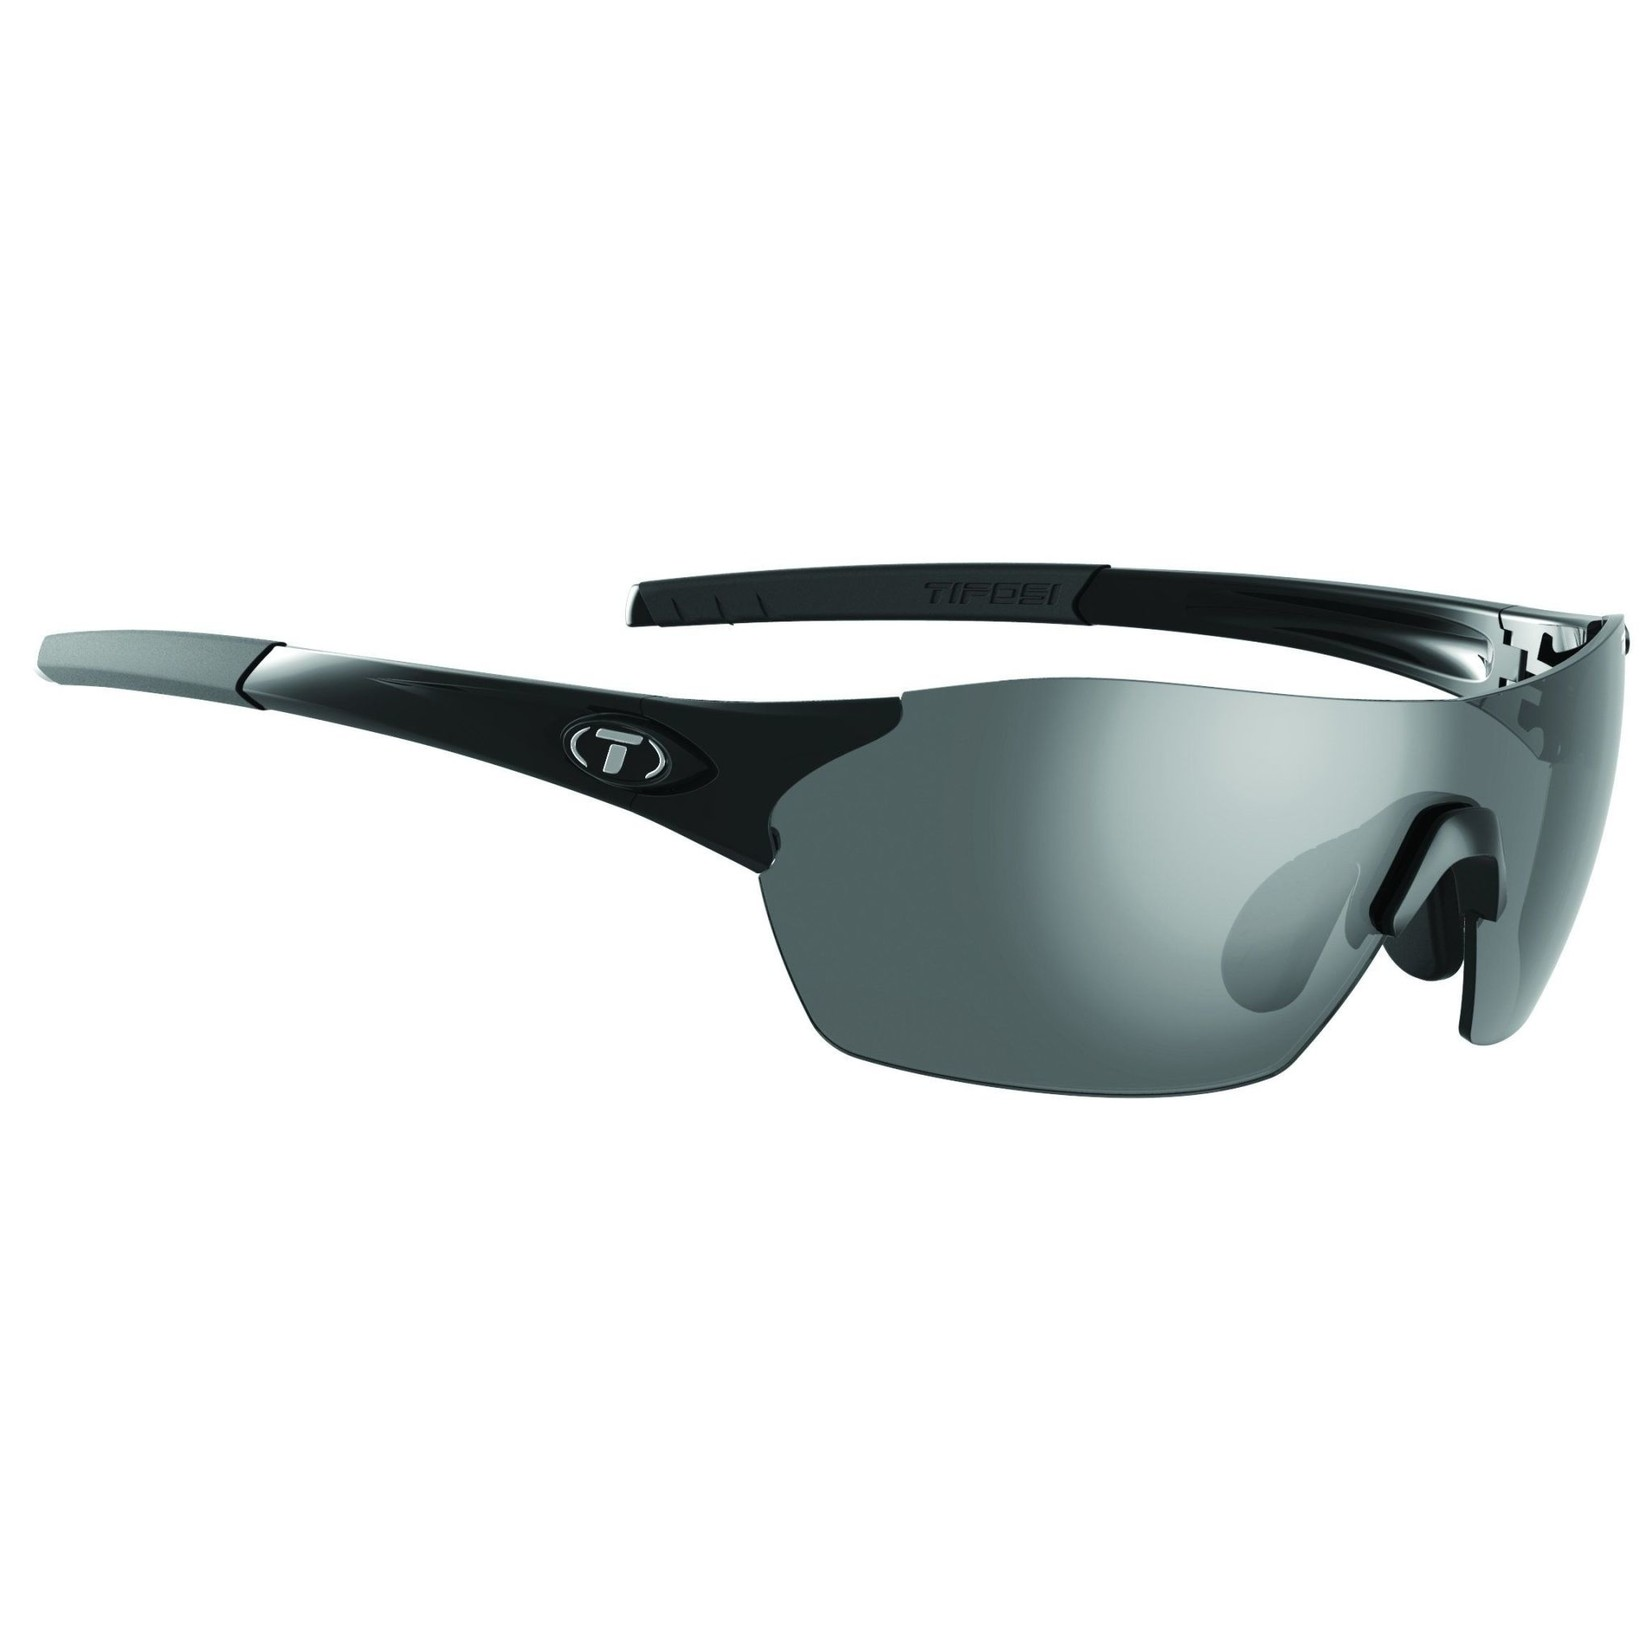 Tifosi Optics Brixen, Gloss Black Interchangeable Sunglasses